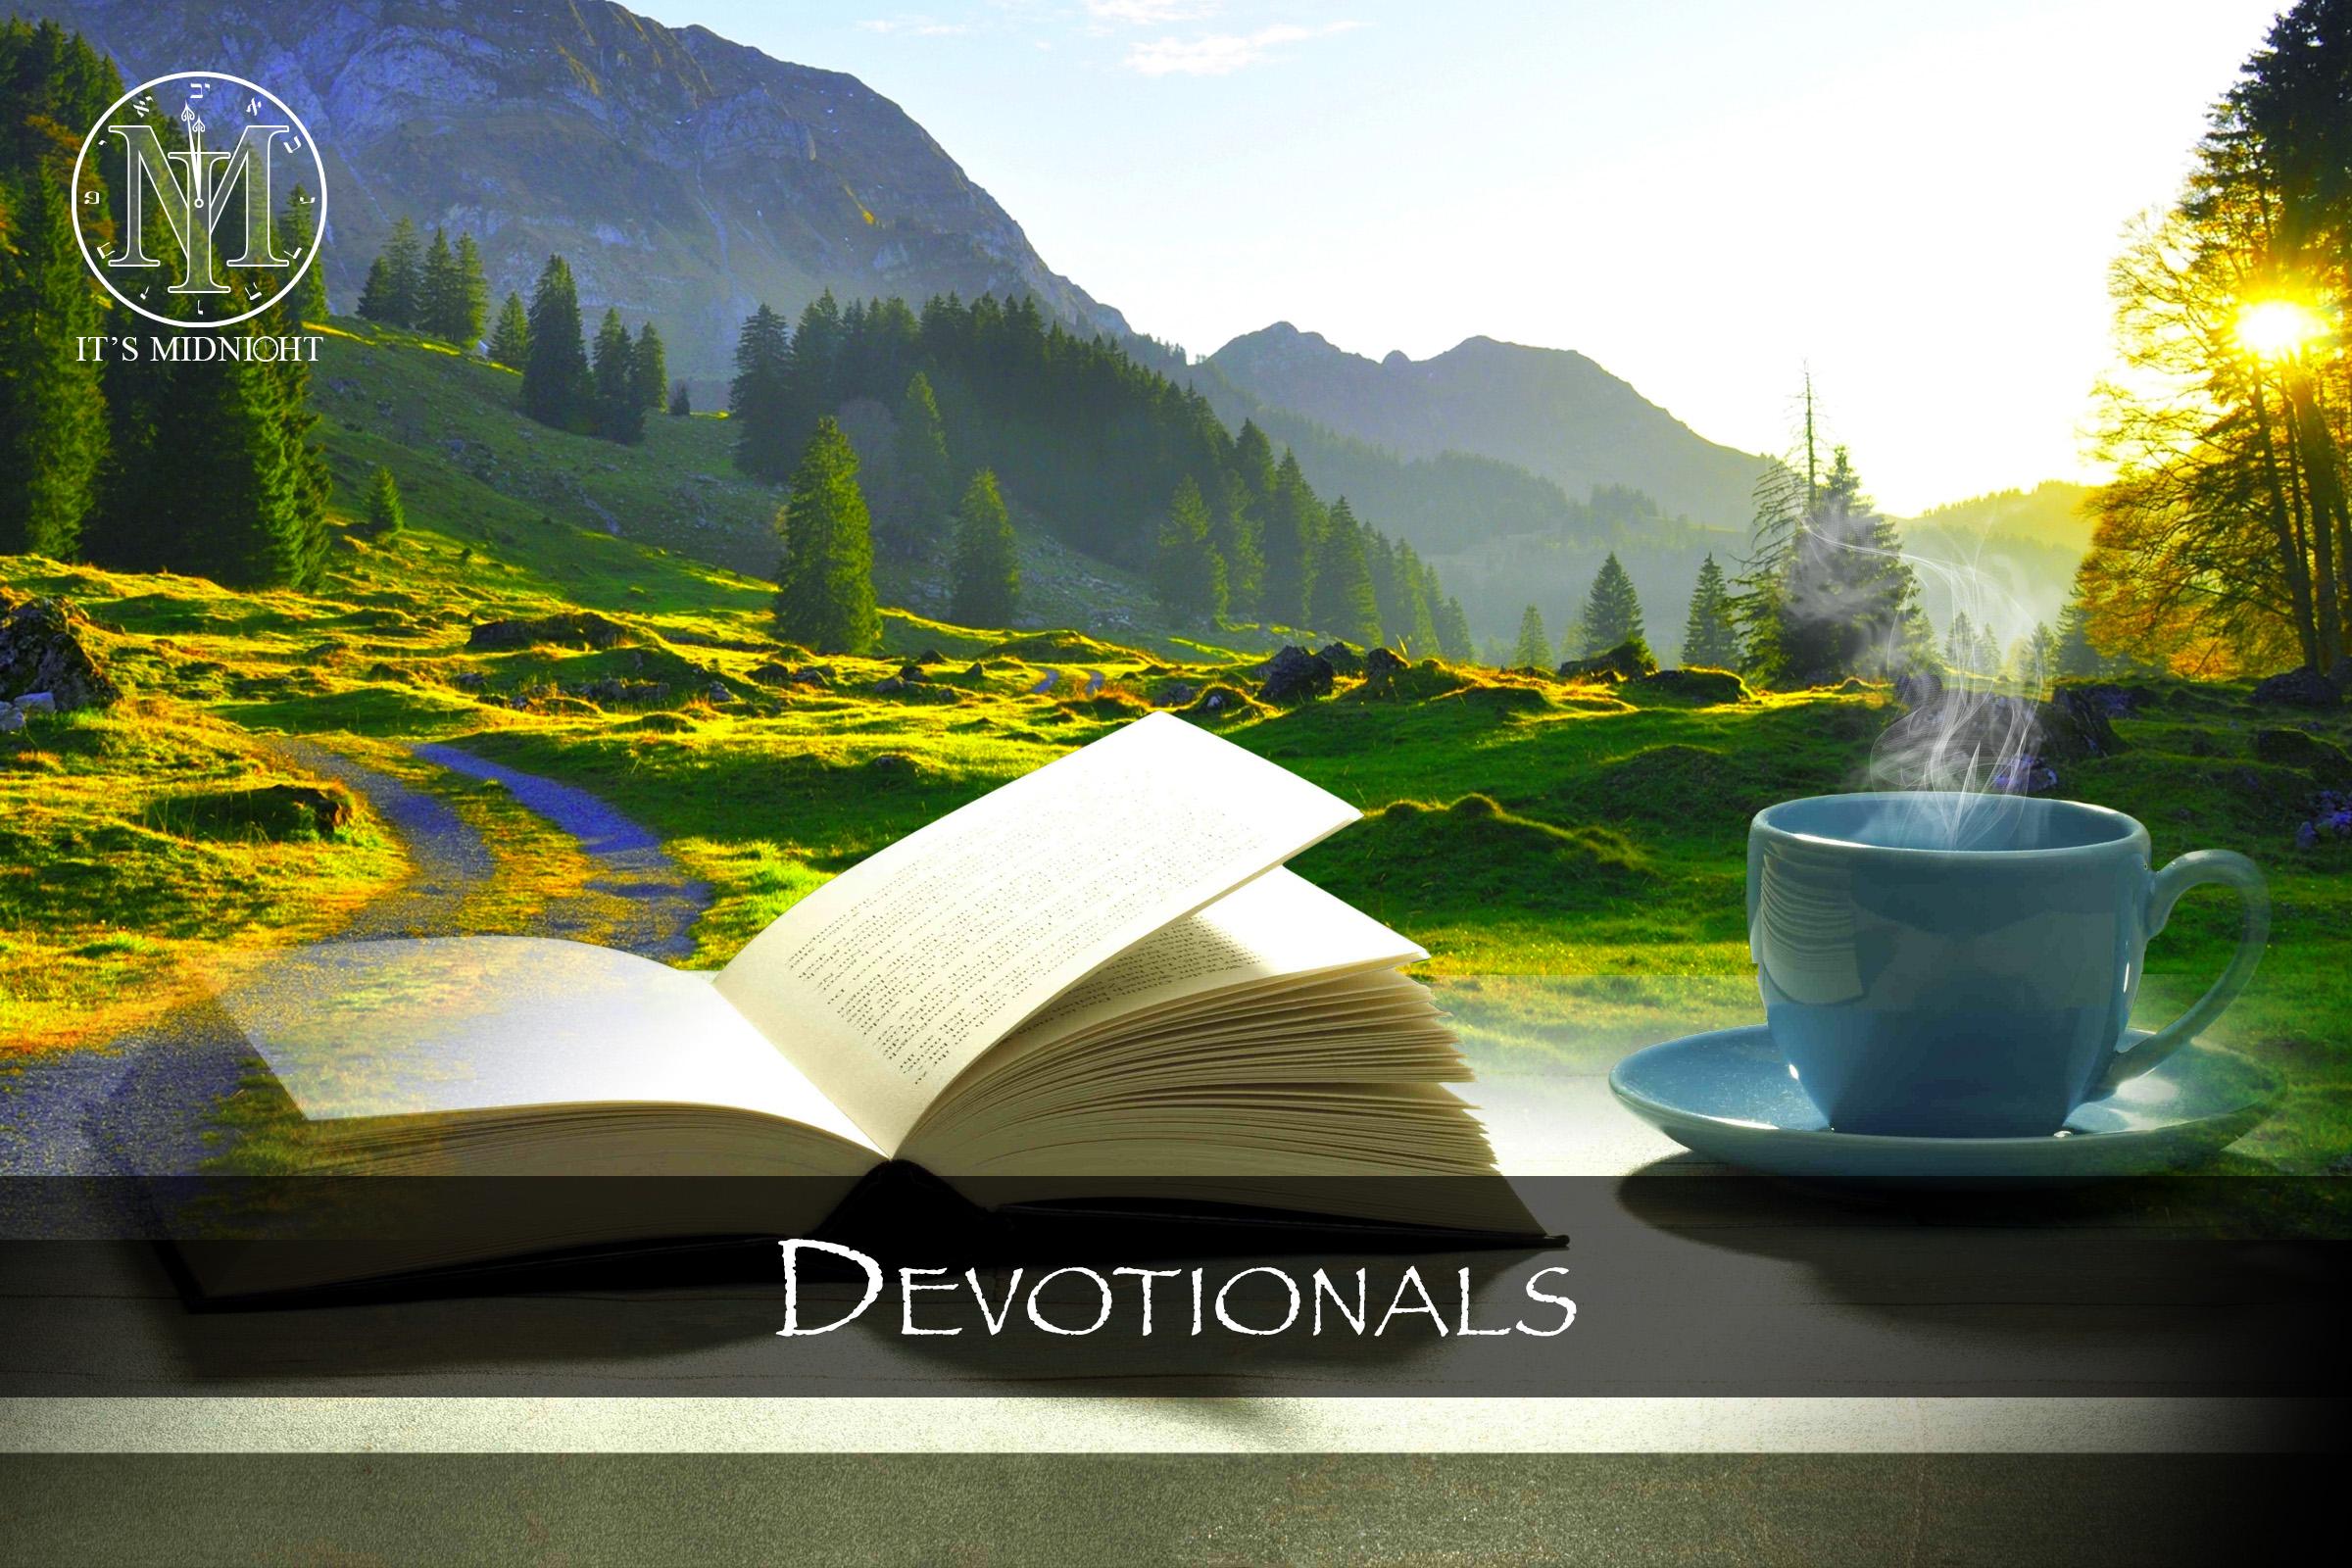 Devotionals Thumbnail.jpg